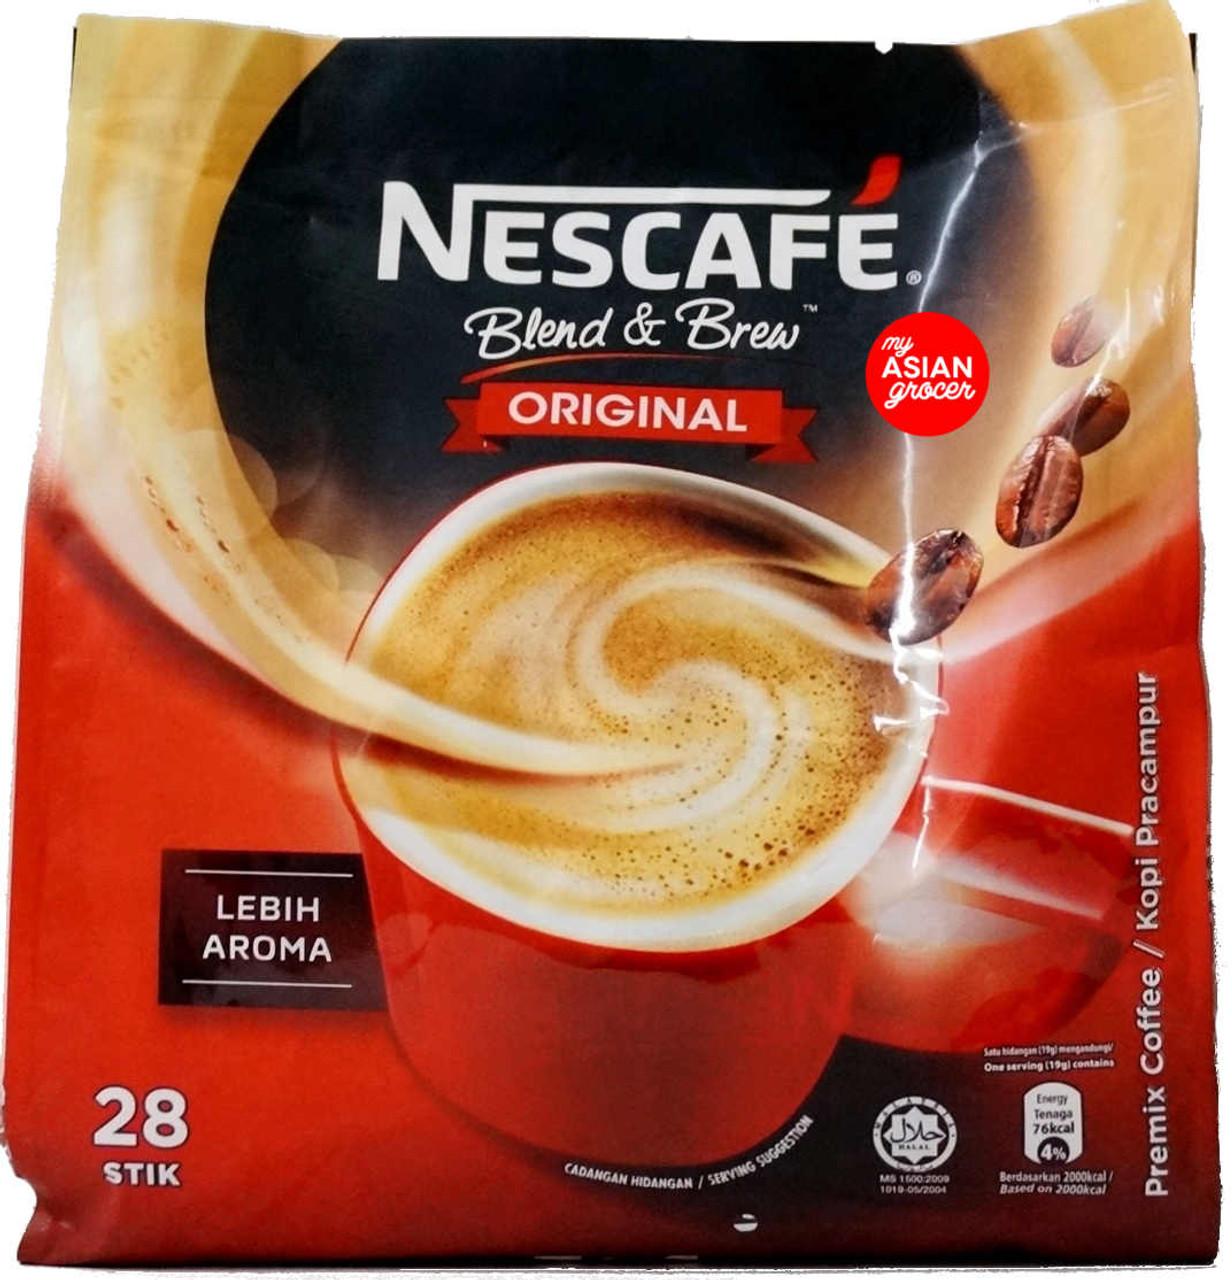 Nescafe Blend & Brew Original 19g x 28 Sticks